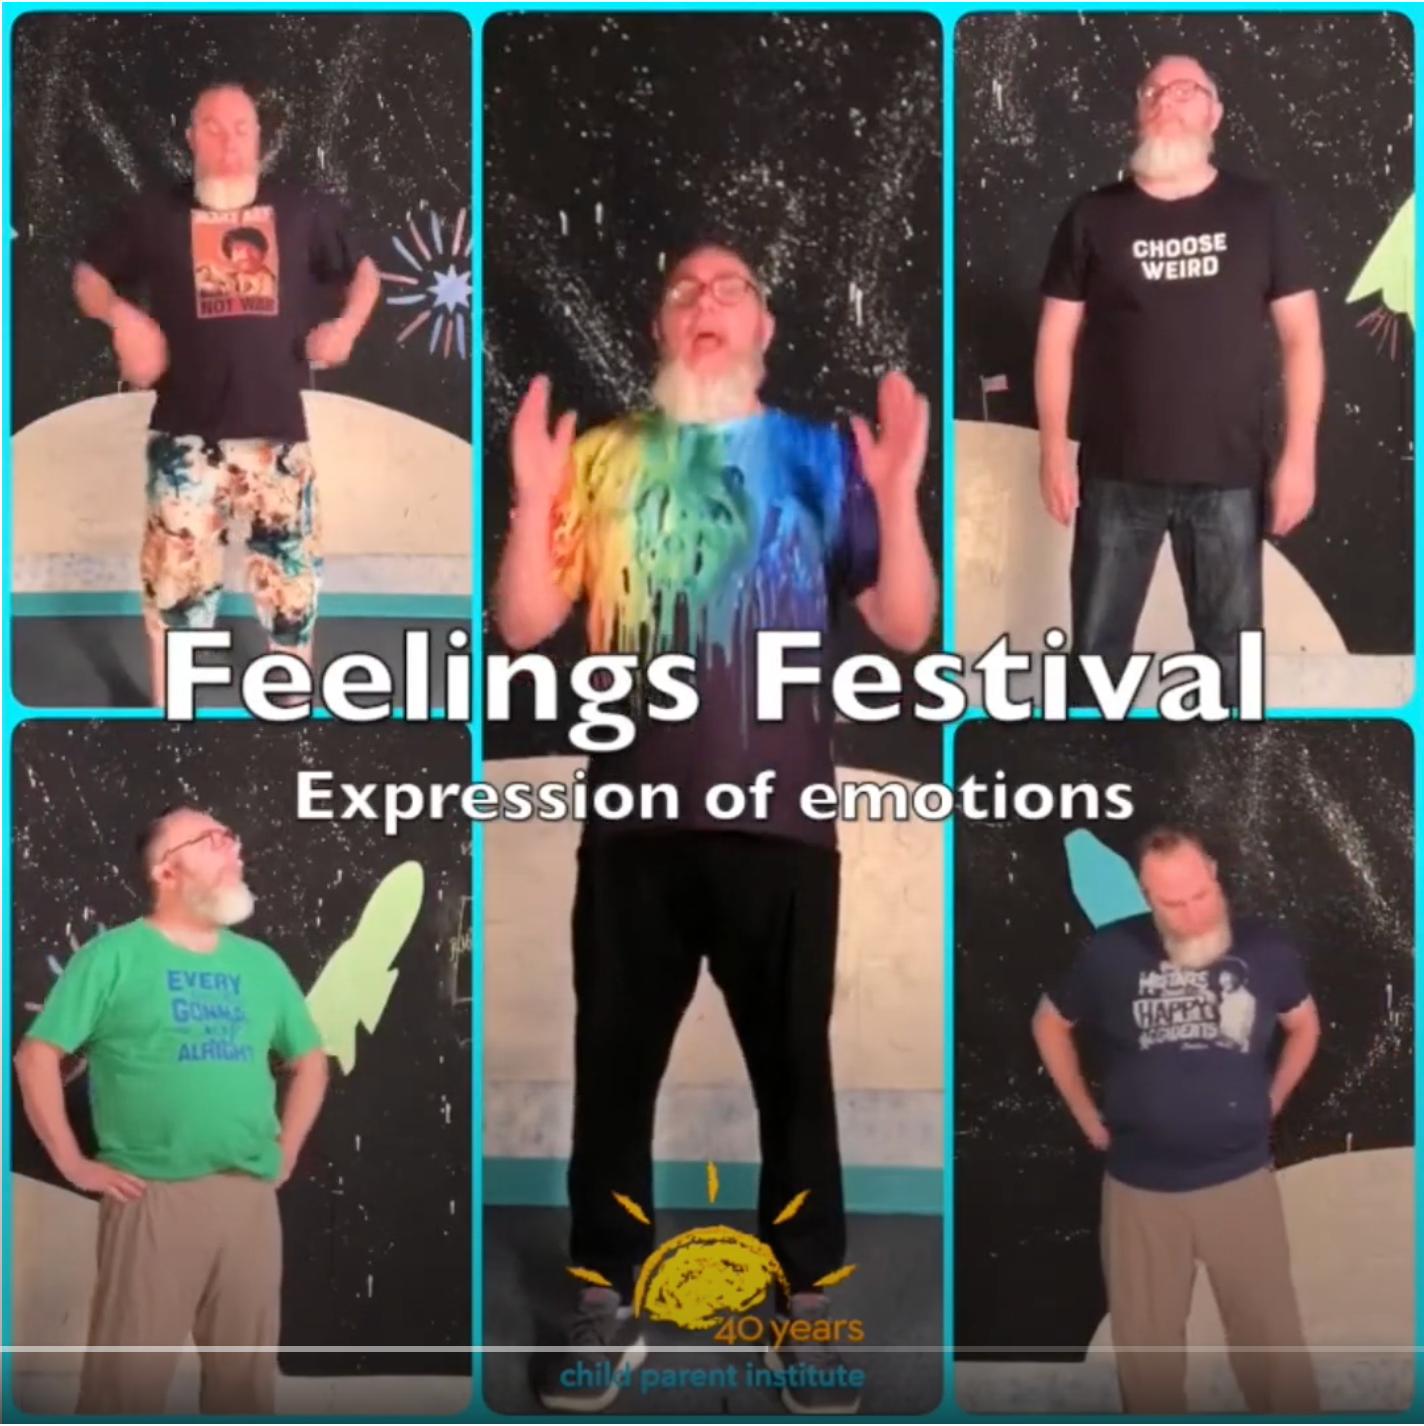 Feelings Festival